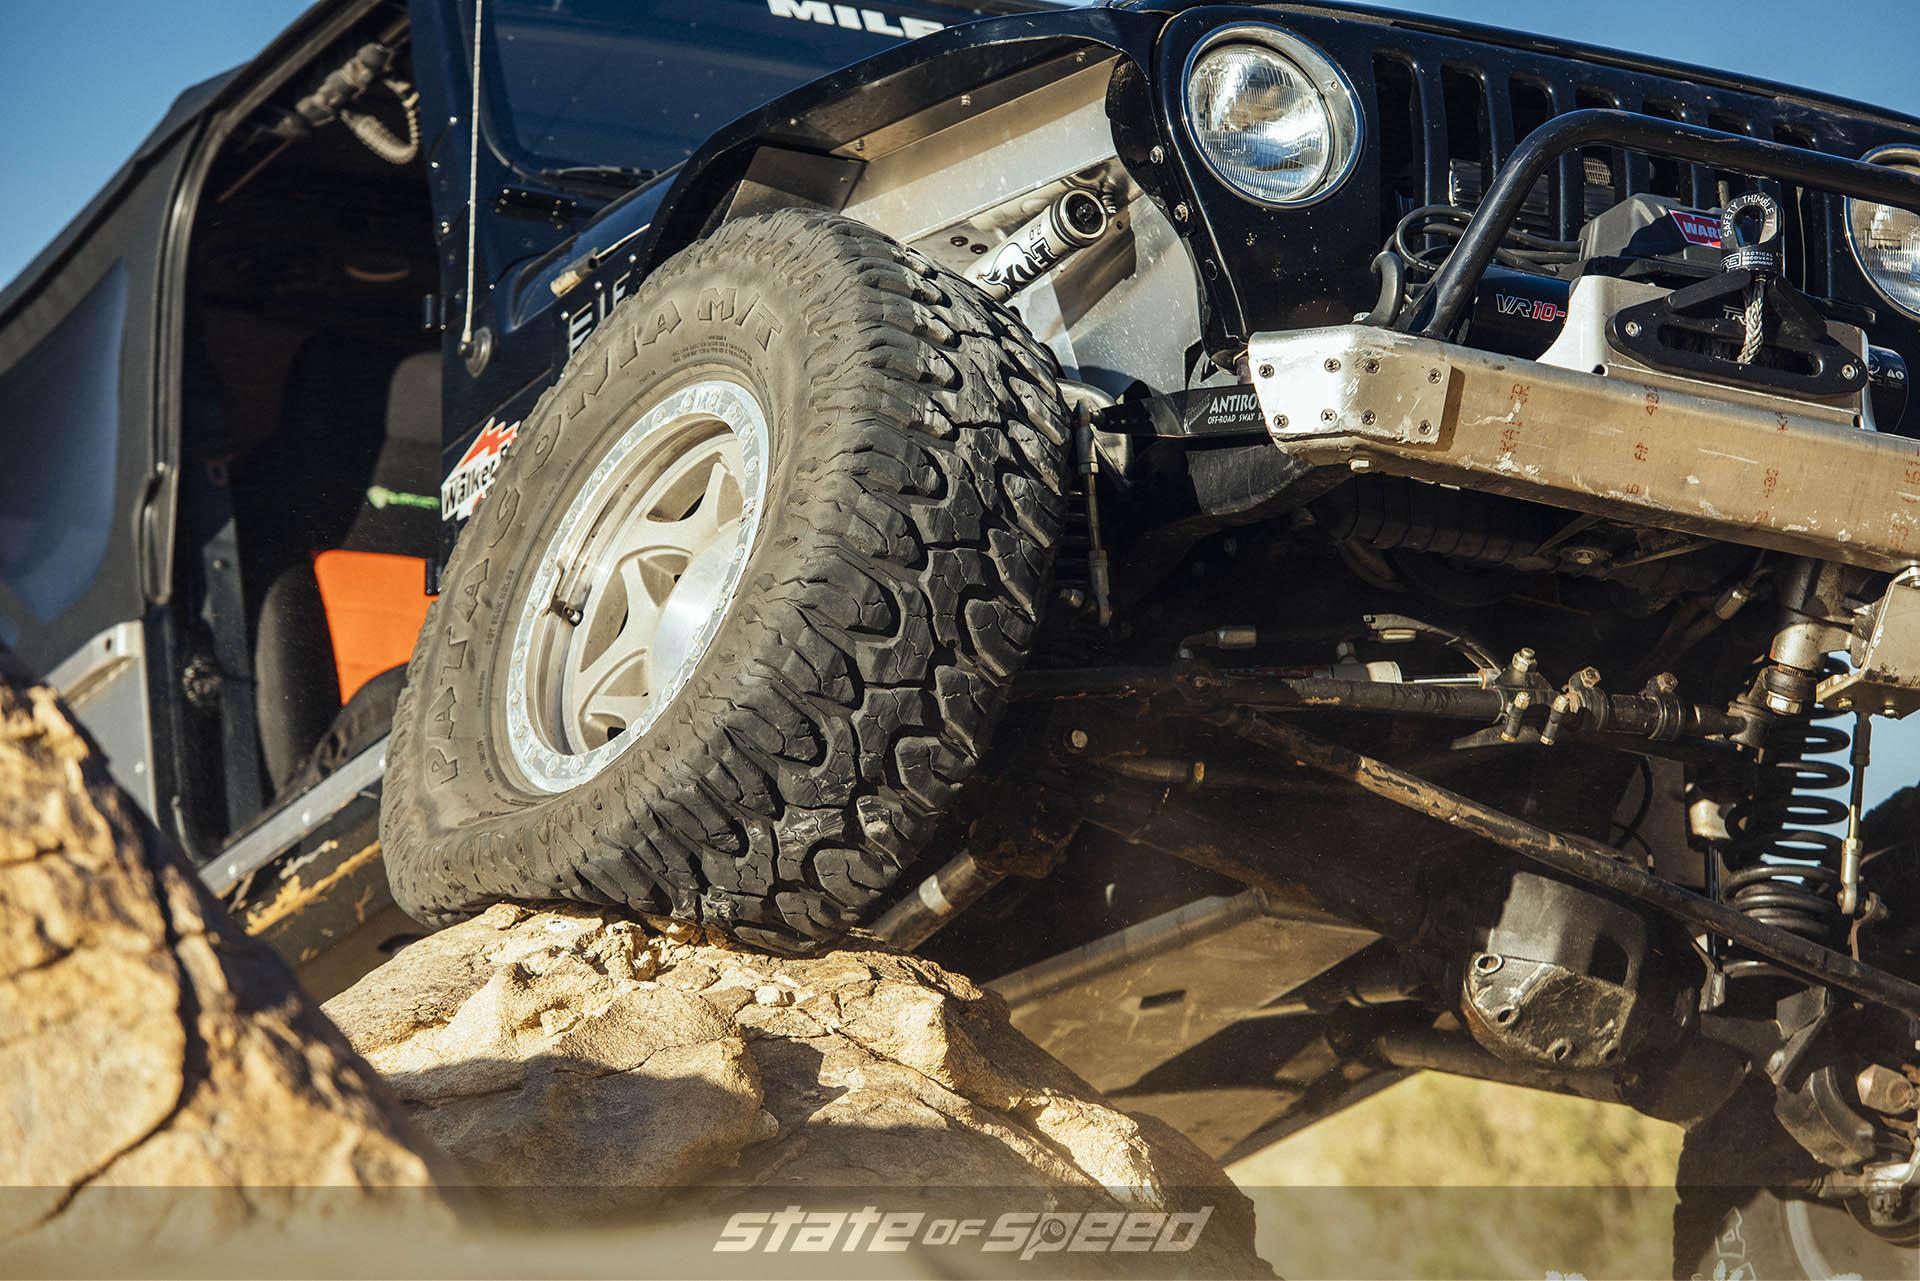 Jeep TJ Wrangler with Milestar Patagonia M/Ts mounte with beadlocks